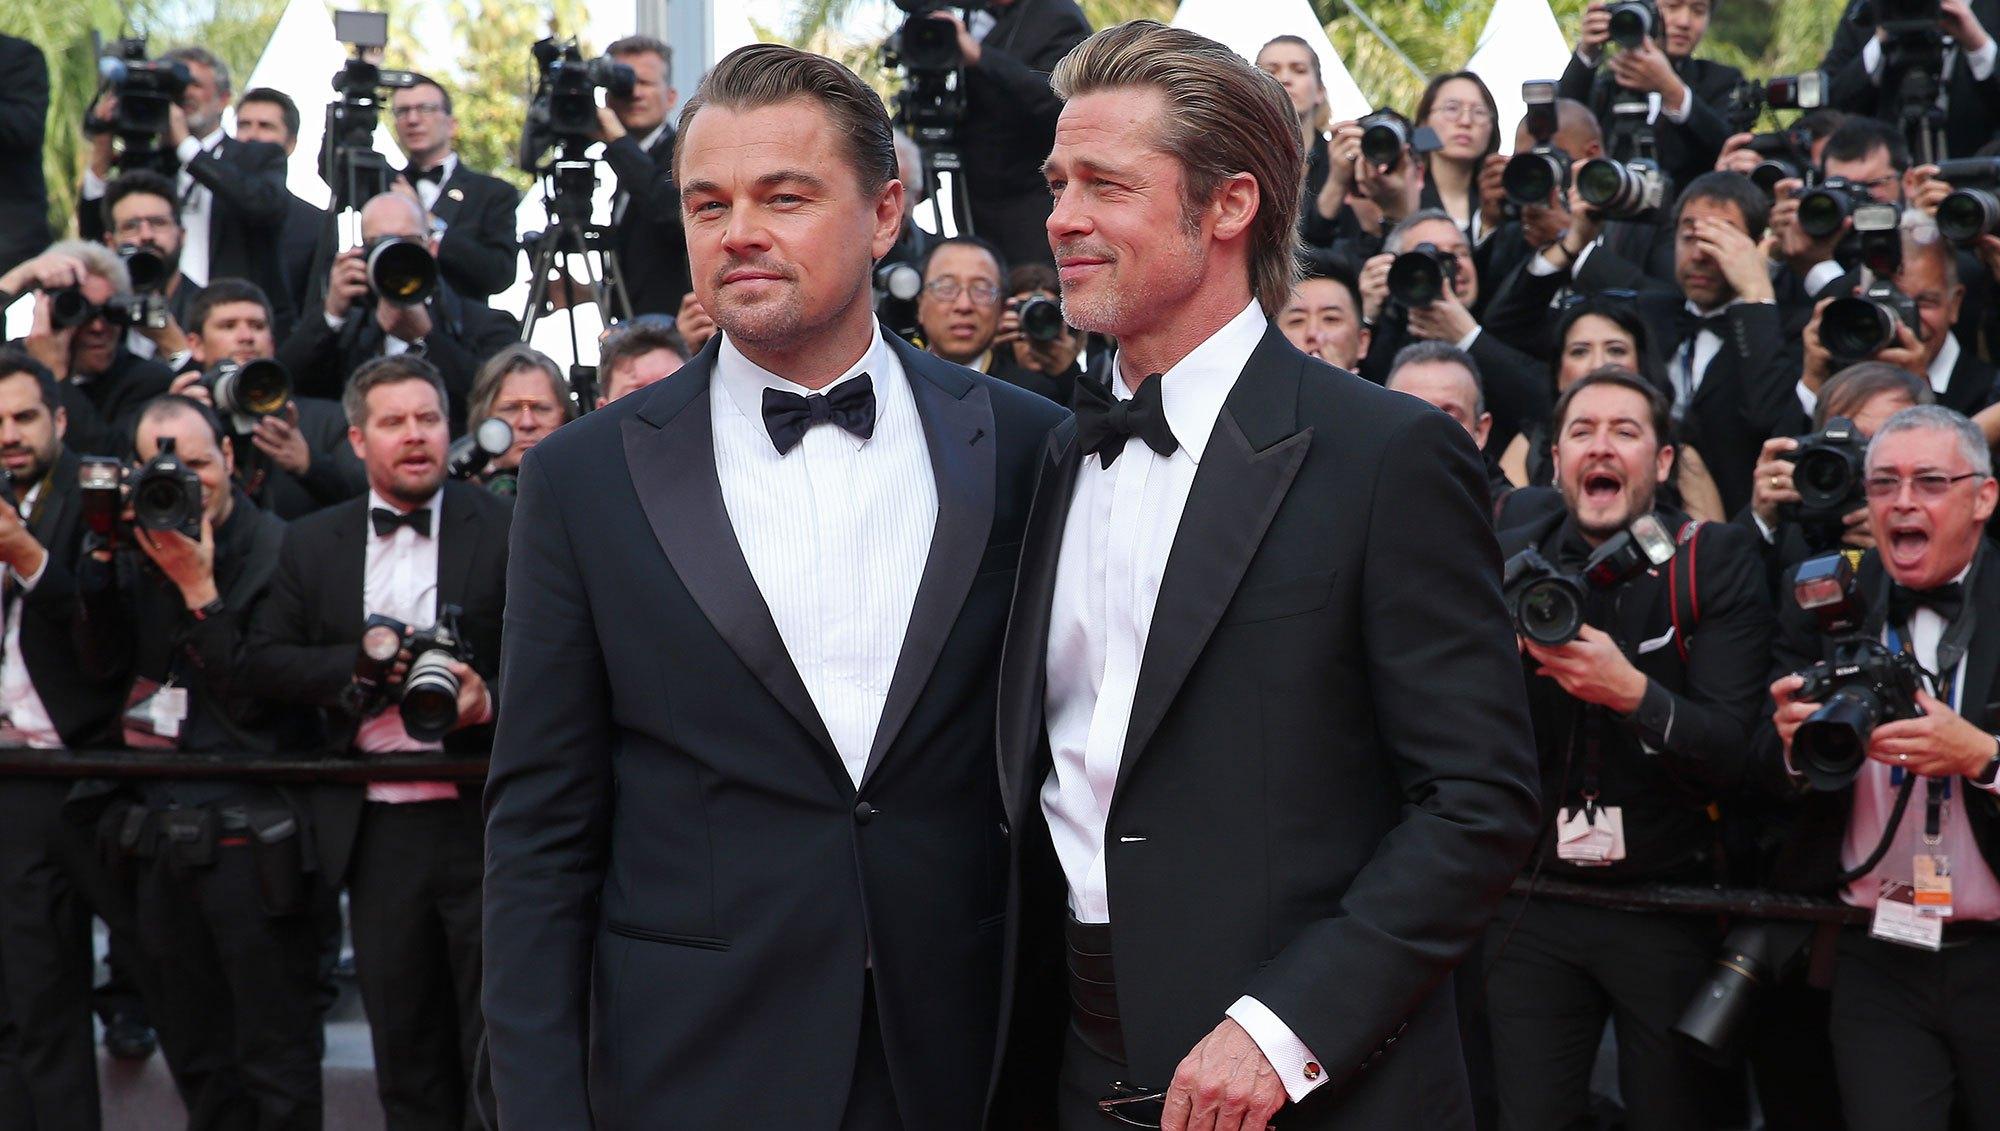 Leonardo DiCaprio and Brad Pitt Cannes Film Festival 2019 Most Stylish Guys Red Carpet